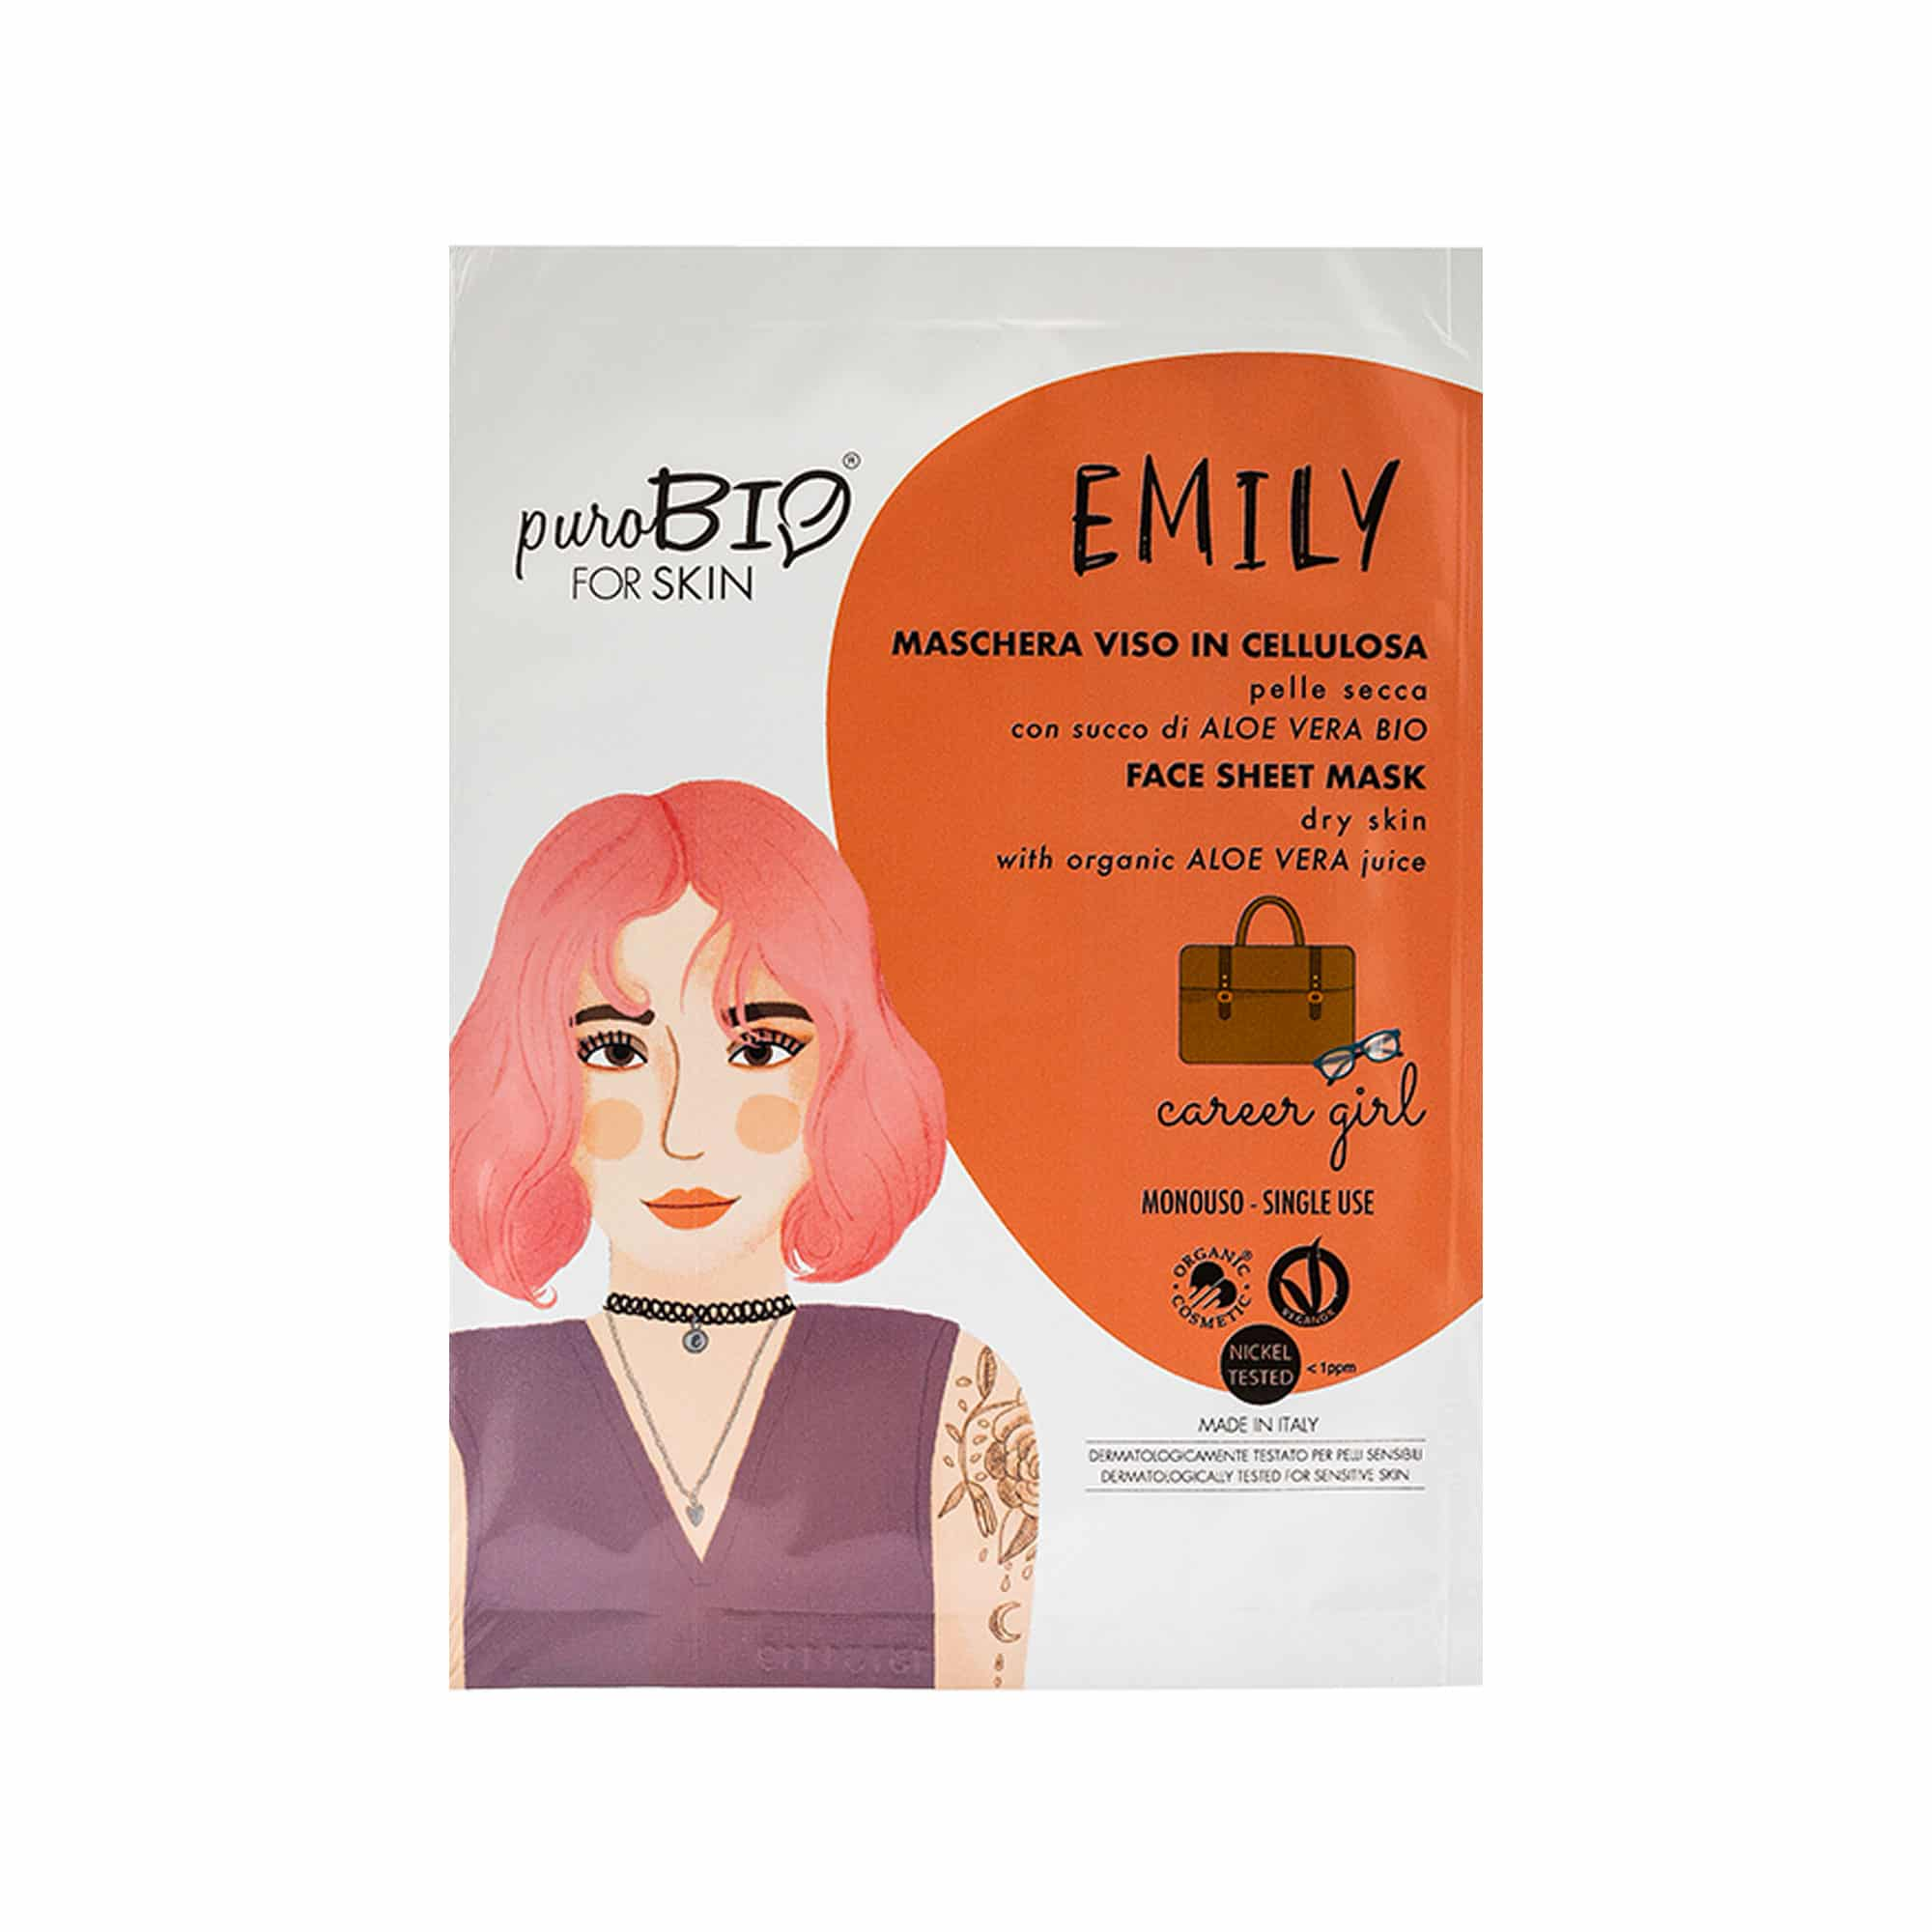 Masque Tissus Emily Career Girl PuroBIo for skin